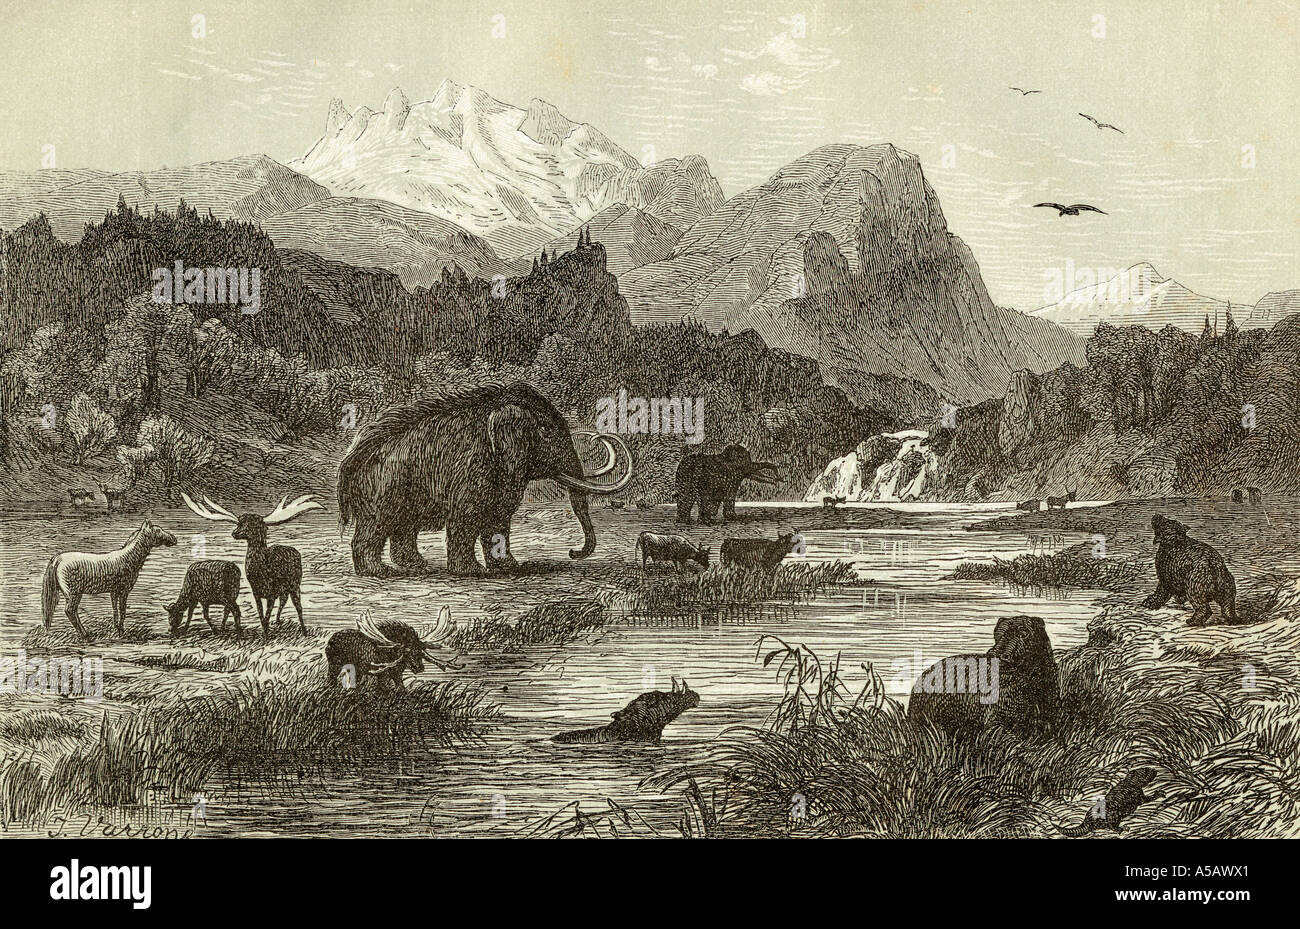 Pliocene age landscape - Stock Image